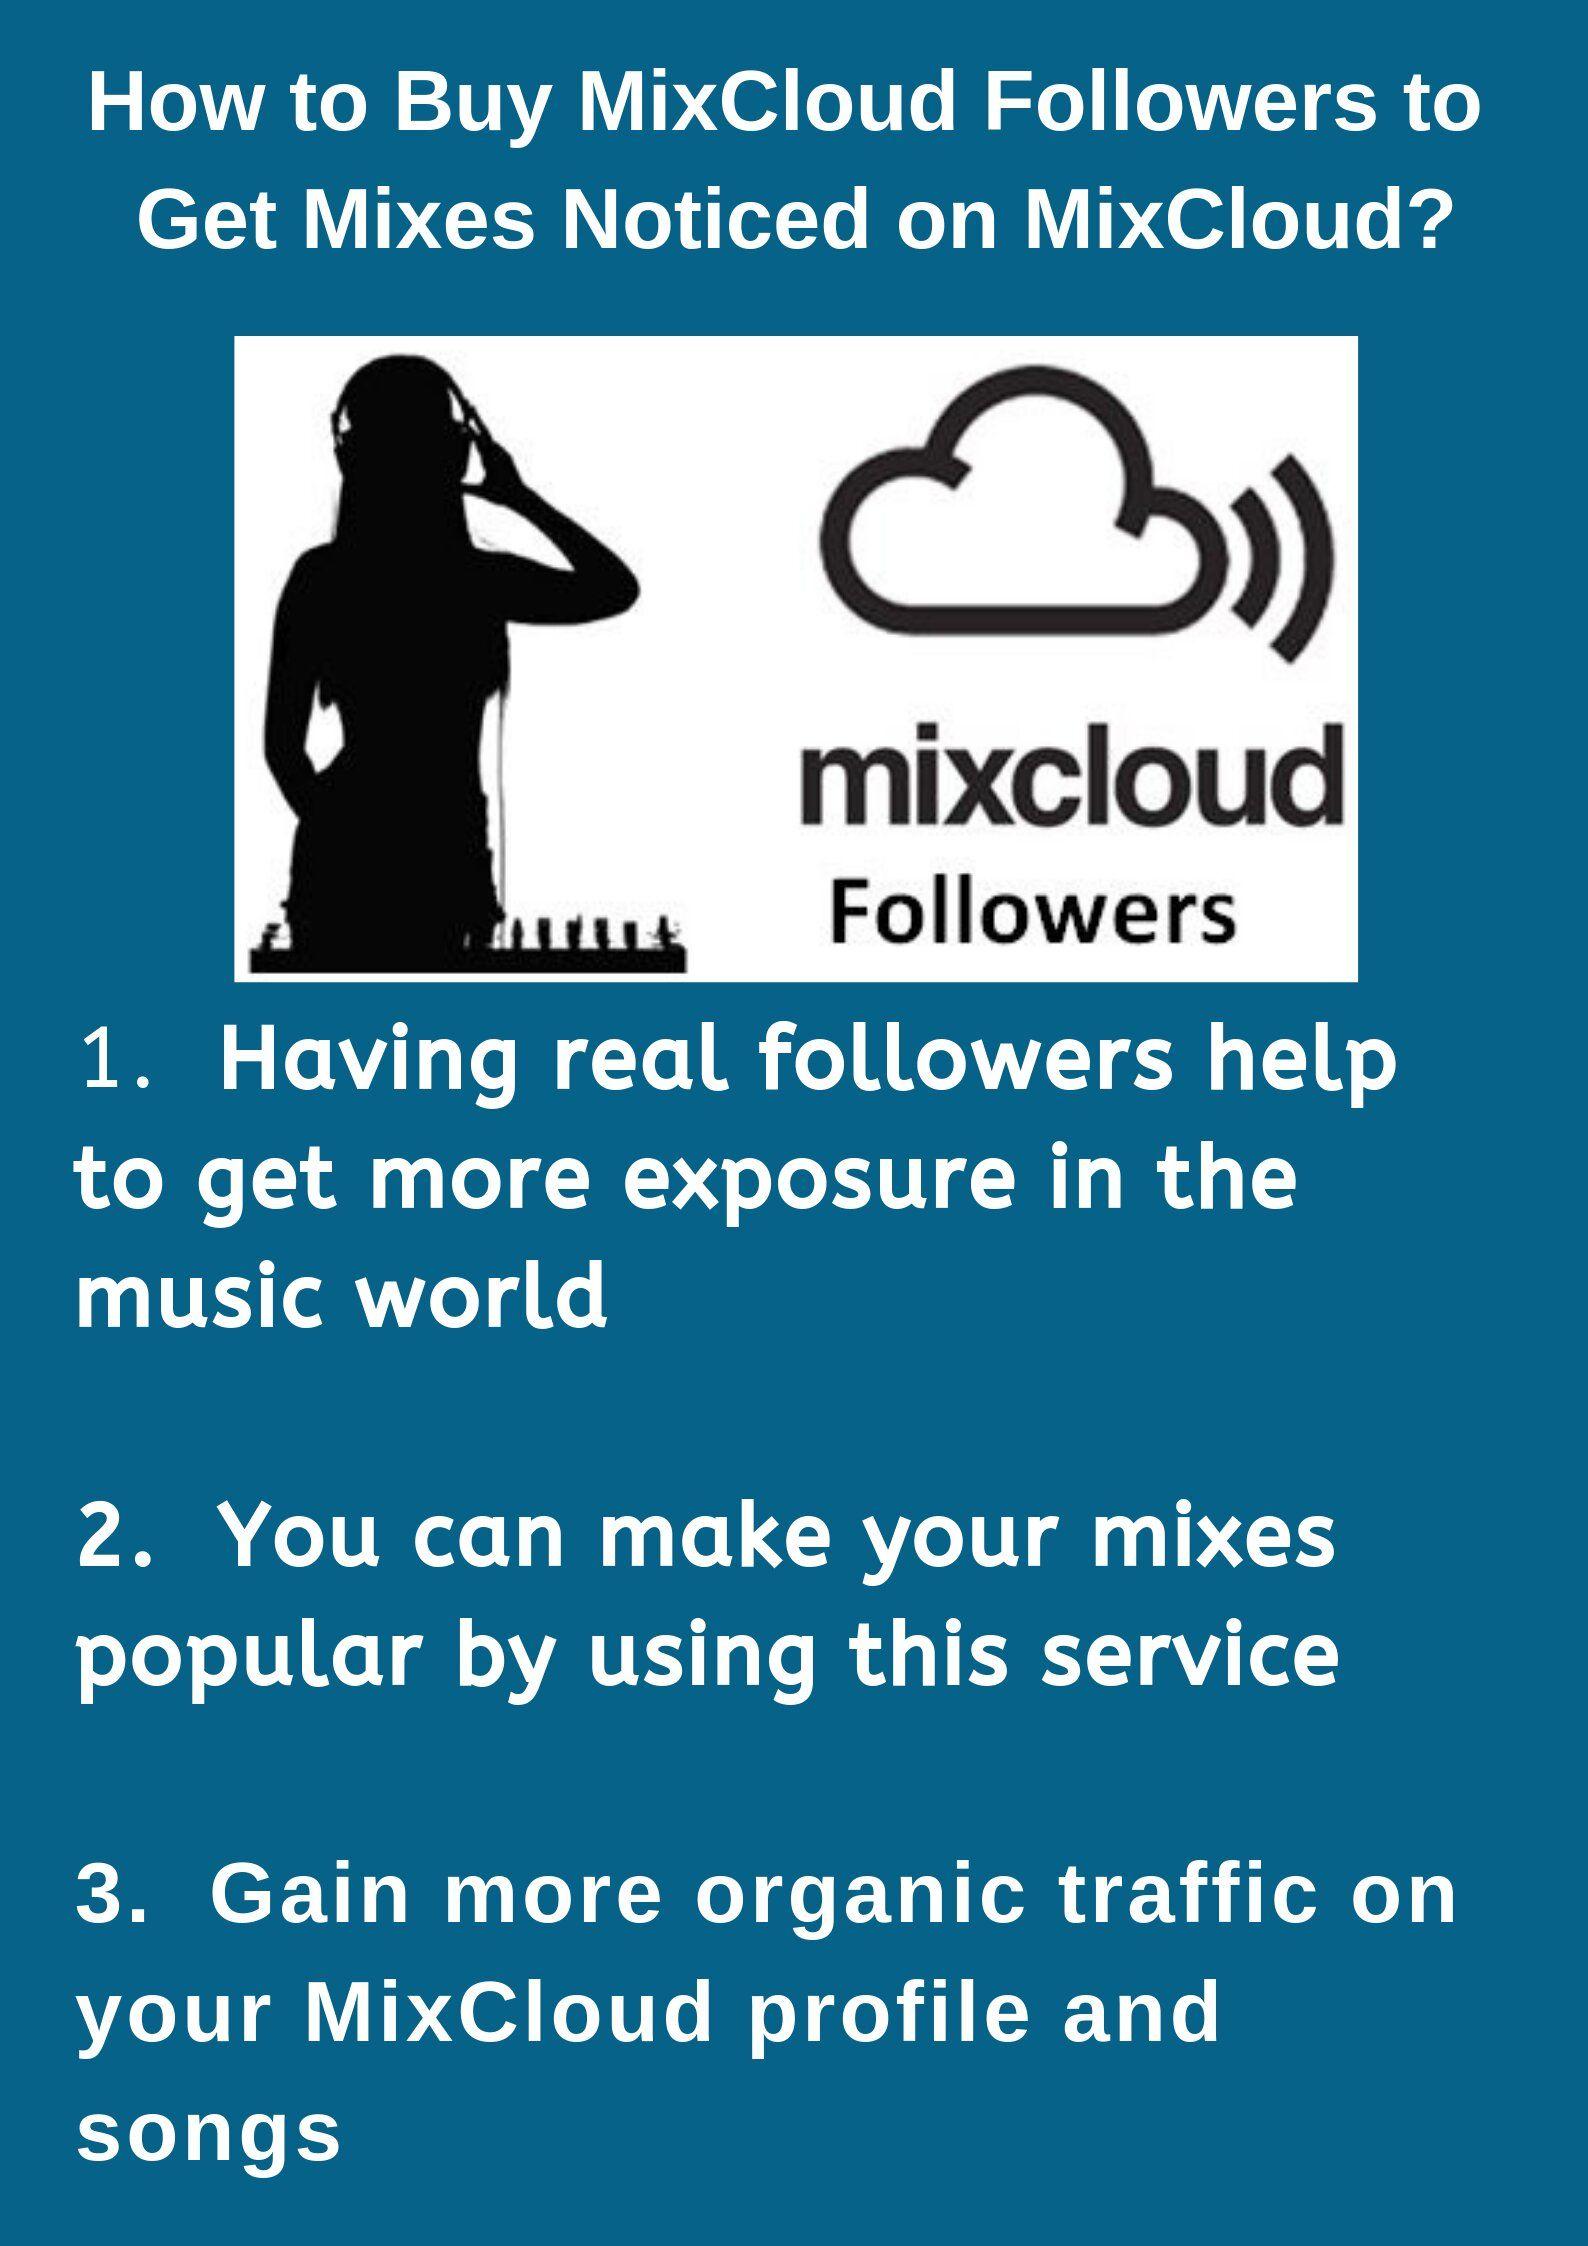 MixCloud is a great platform DJ Mixes, radio Listeners and artist